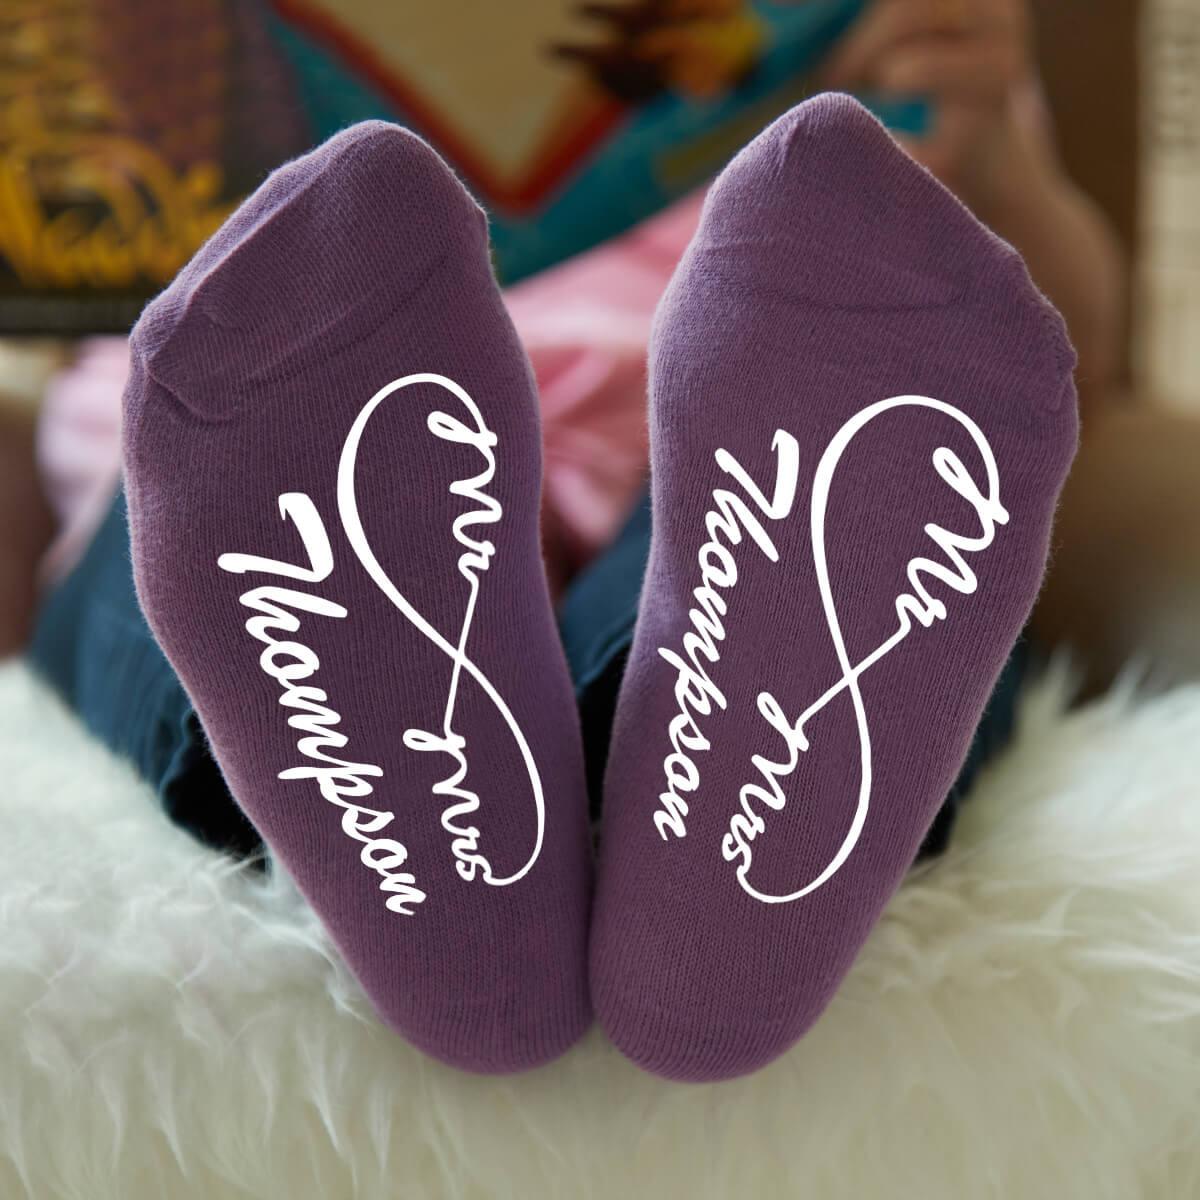 personalised inifinity socks